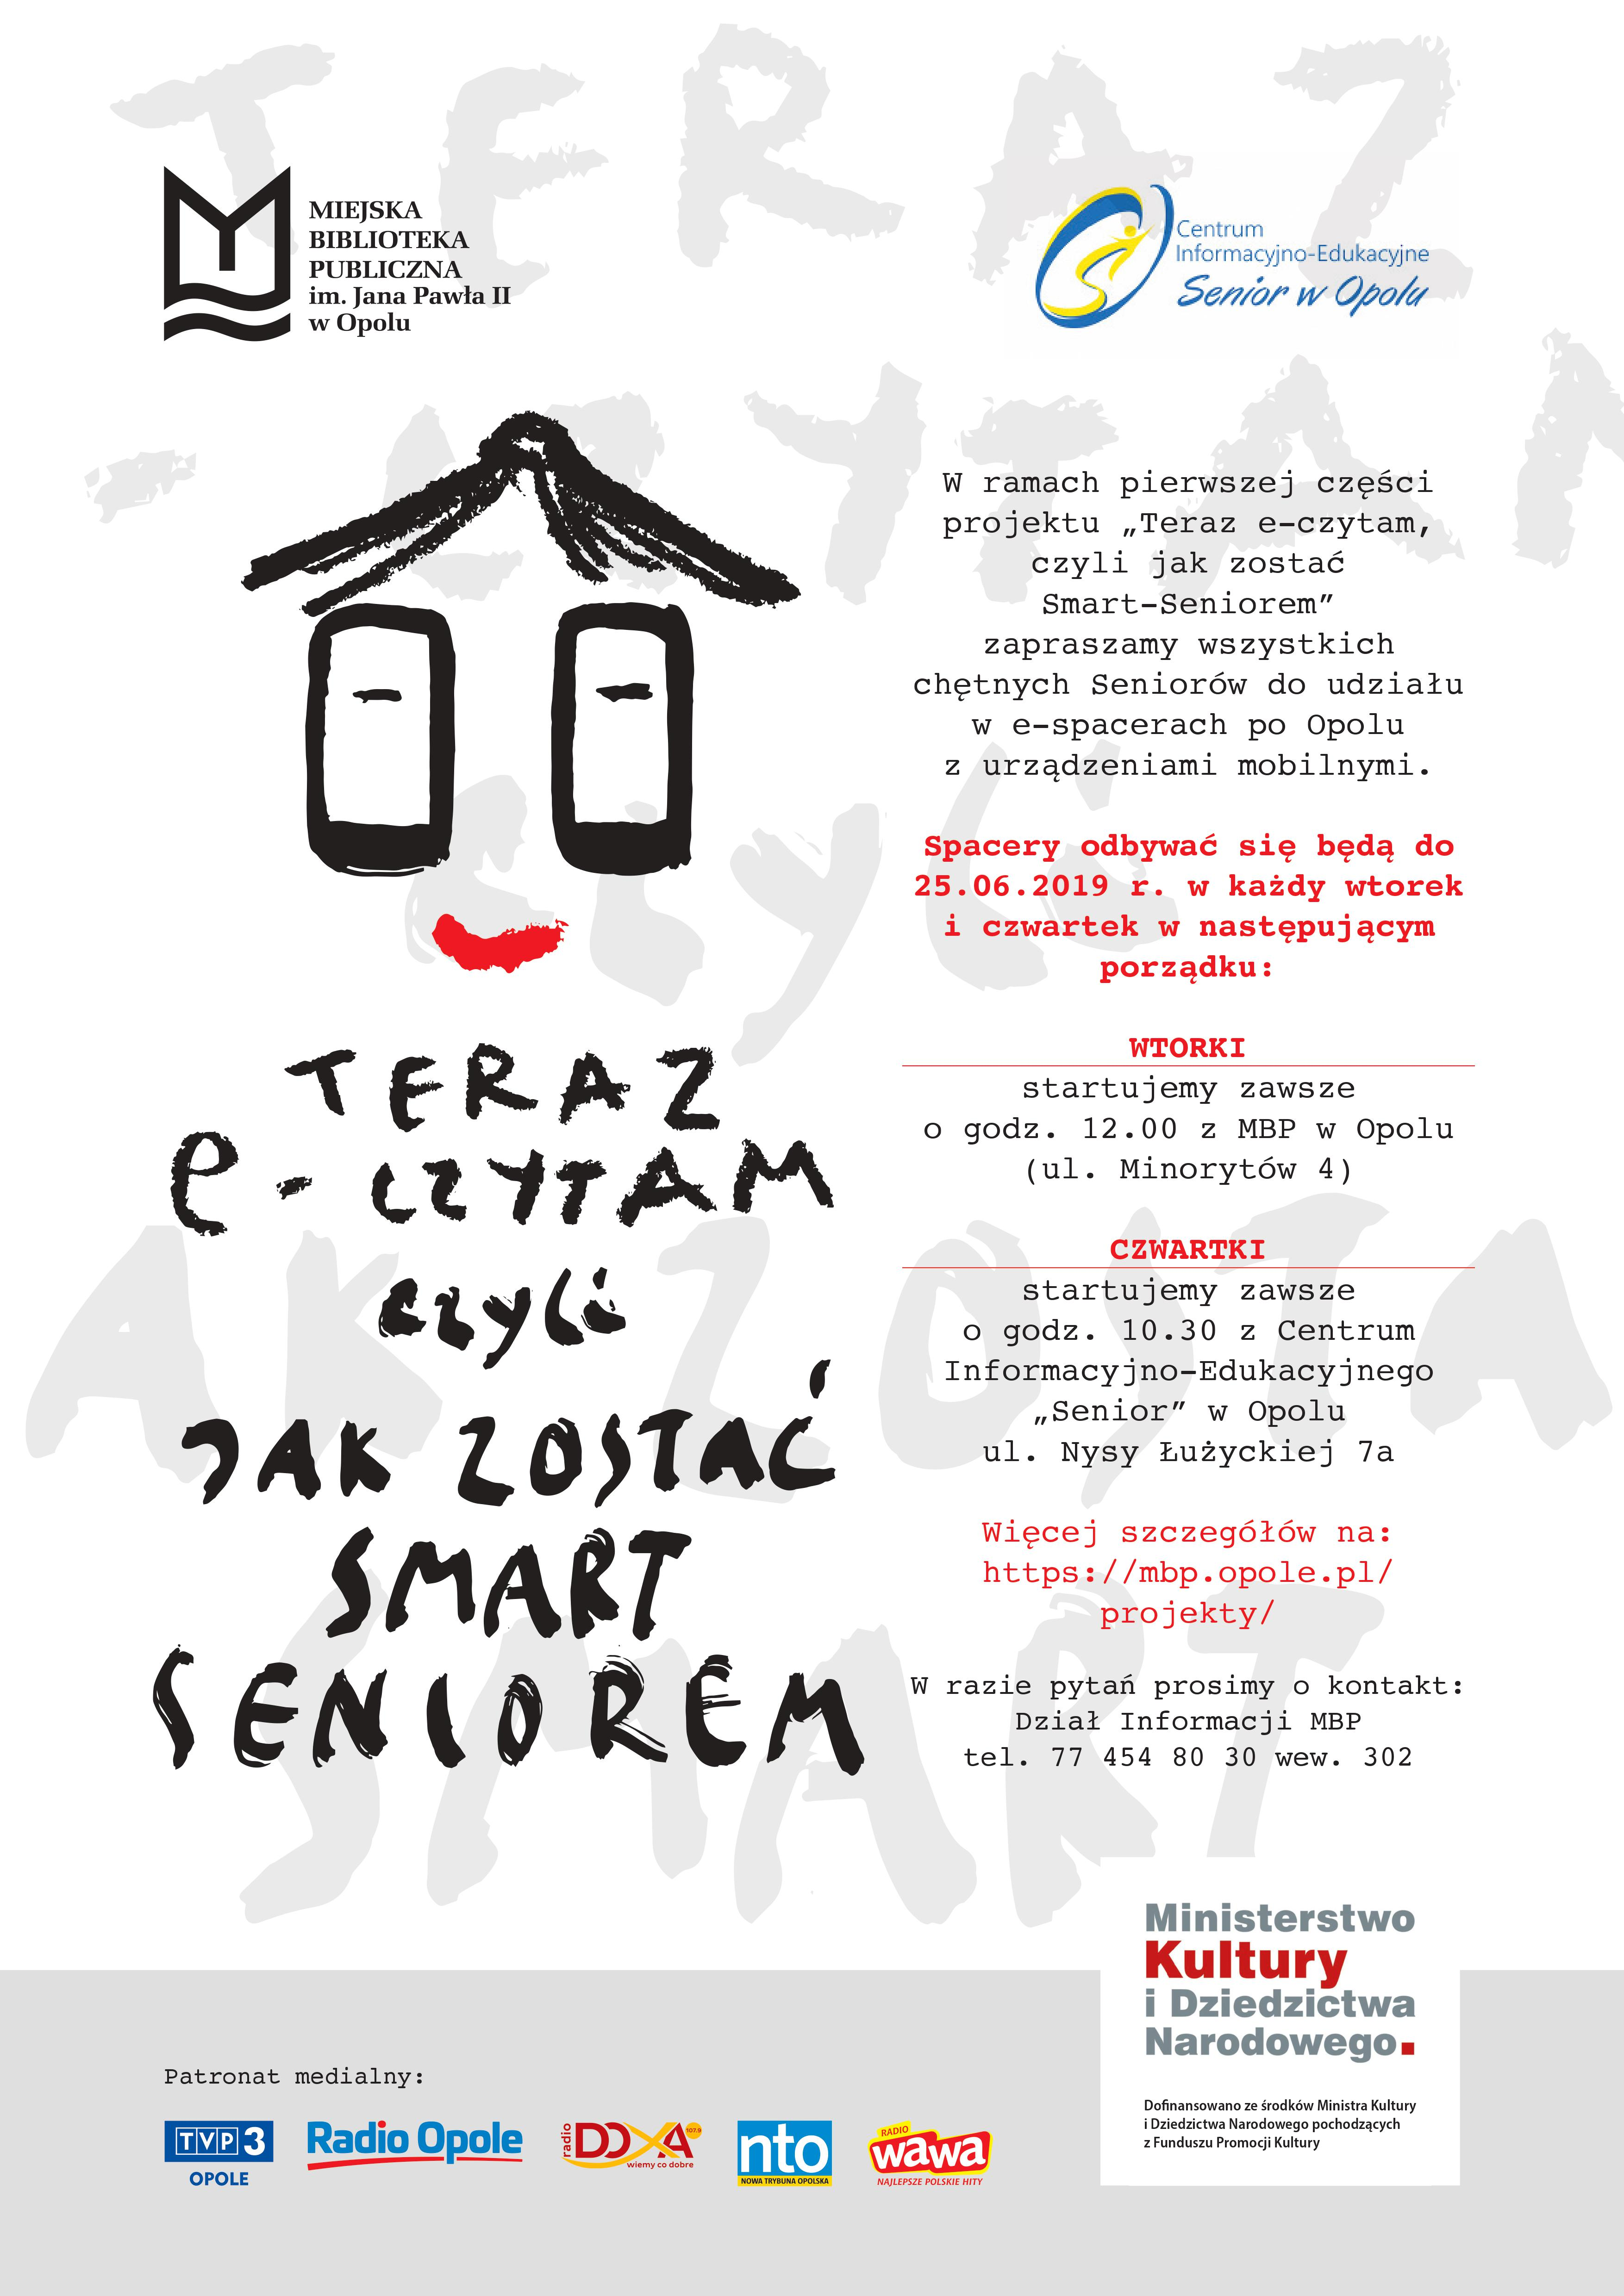 Jak zostać Smart Seniorem - plakat